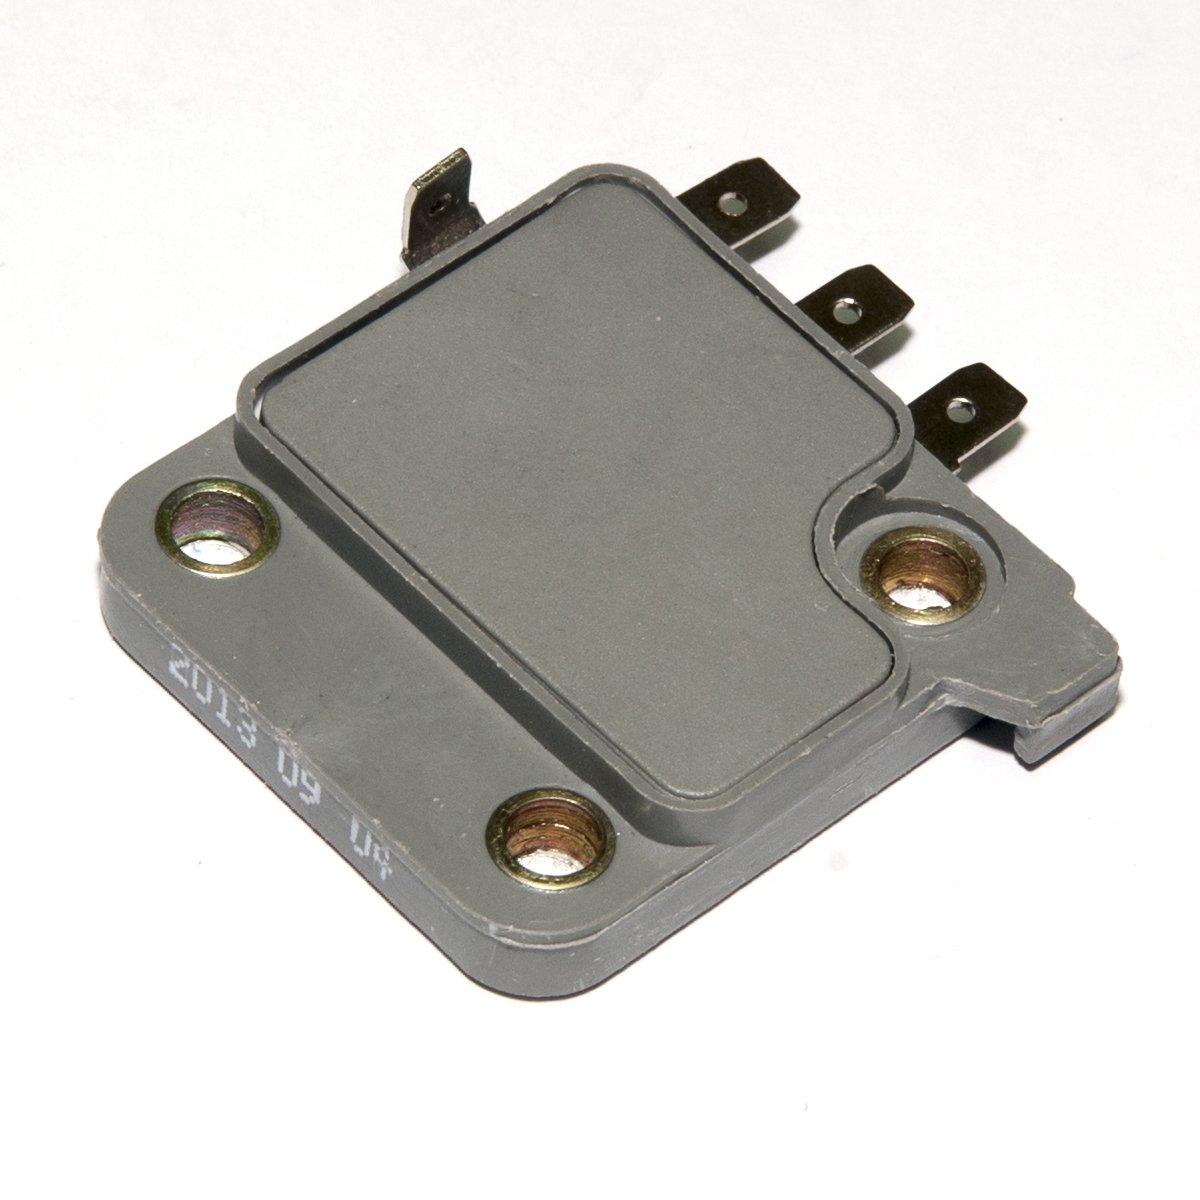 Brand New Compatible Ignition Control Module 88921602 30130P06006 06300P2E305 for Icm Acura Honda LX734 CBE619 DS10060 6H1116 SH7317